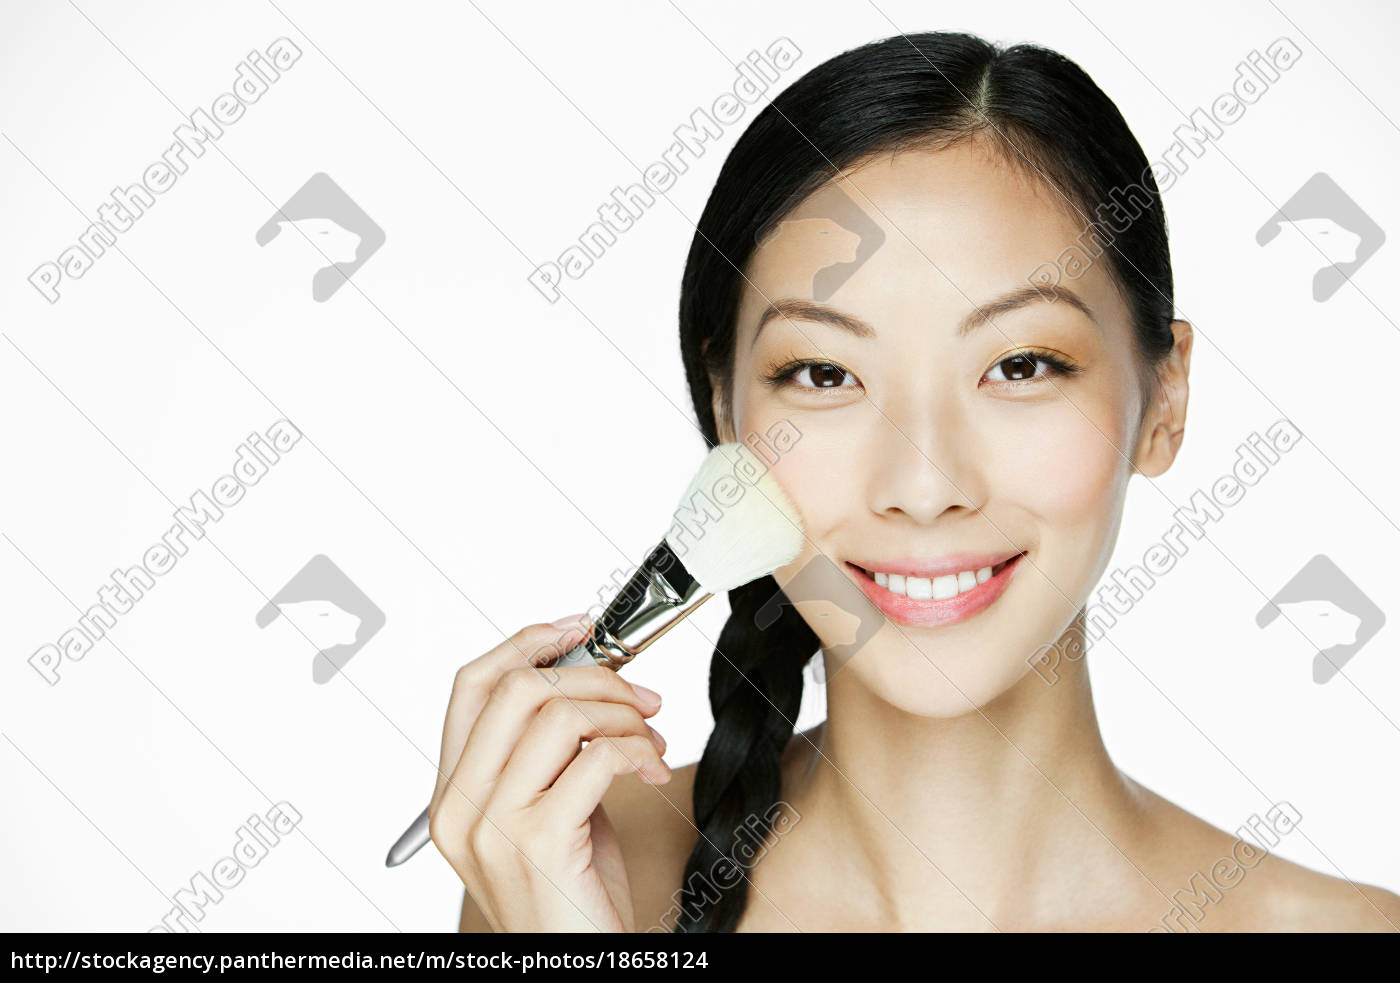 junge, frau, mit, make-up-pinsel - 18658124